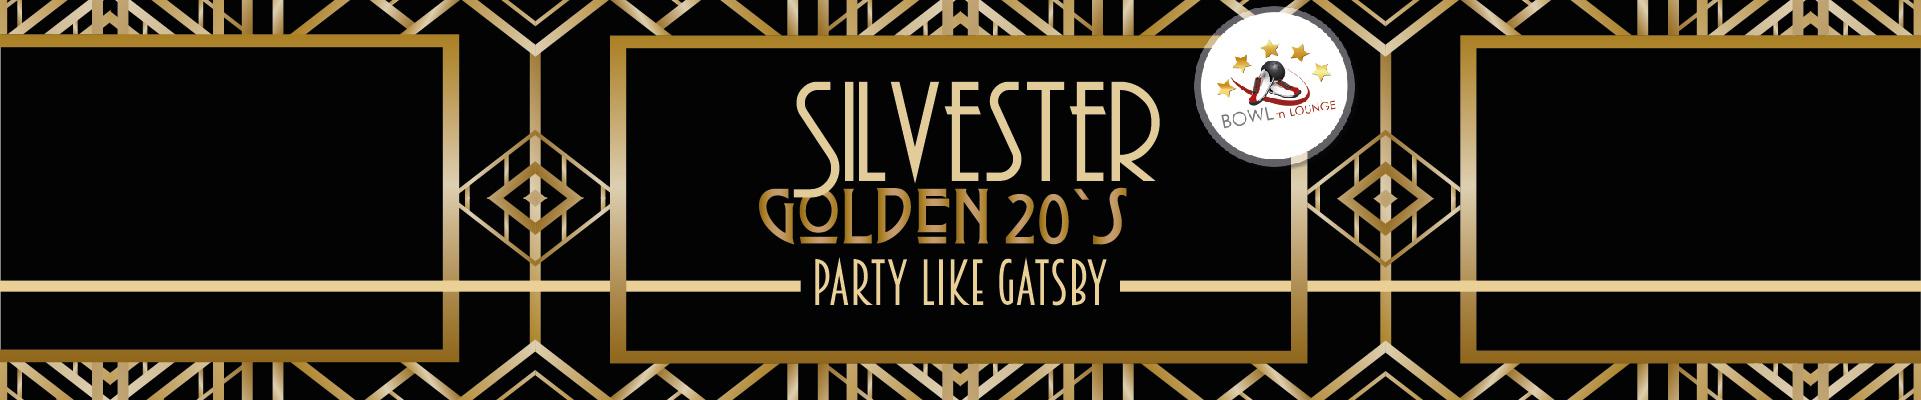 Silvester2019-_Golden_20s_-1920x400_-_Homepage-01_klein